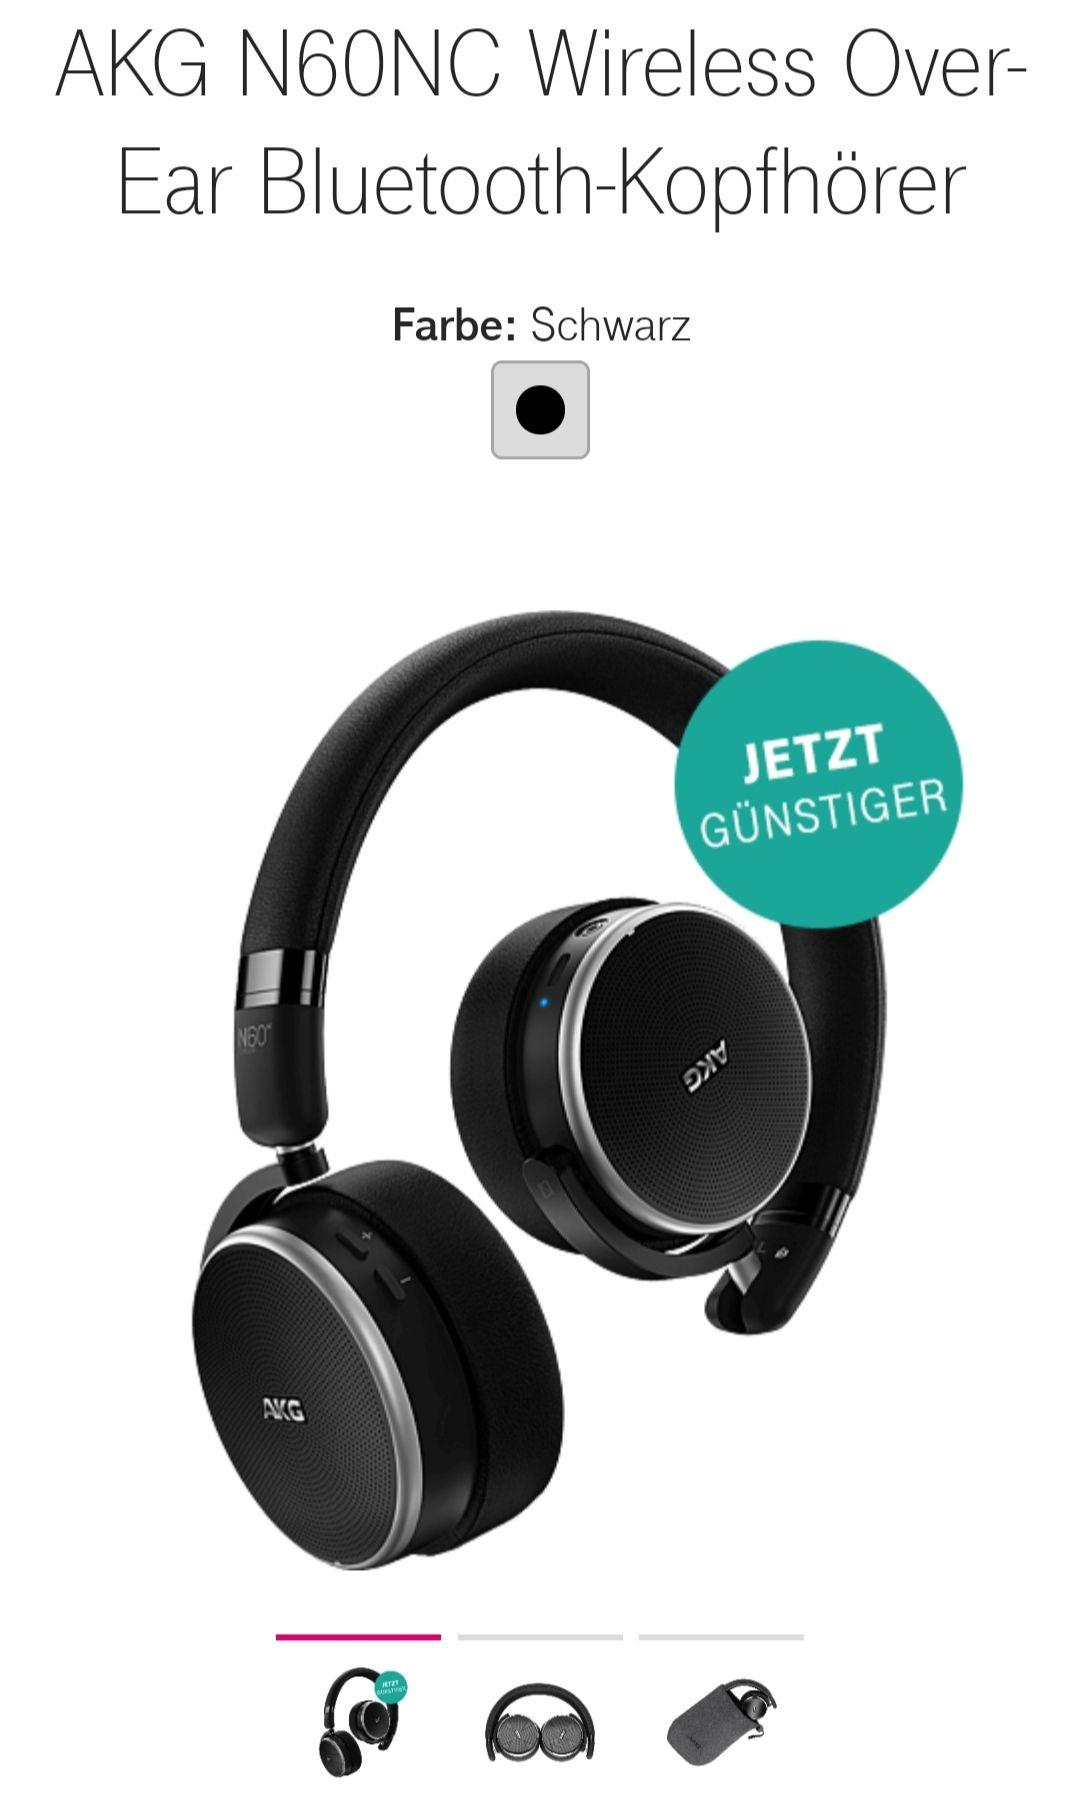 AKG N60NC Wireless Over-Ear Bluetooth-Kopfhörer